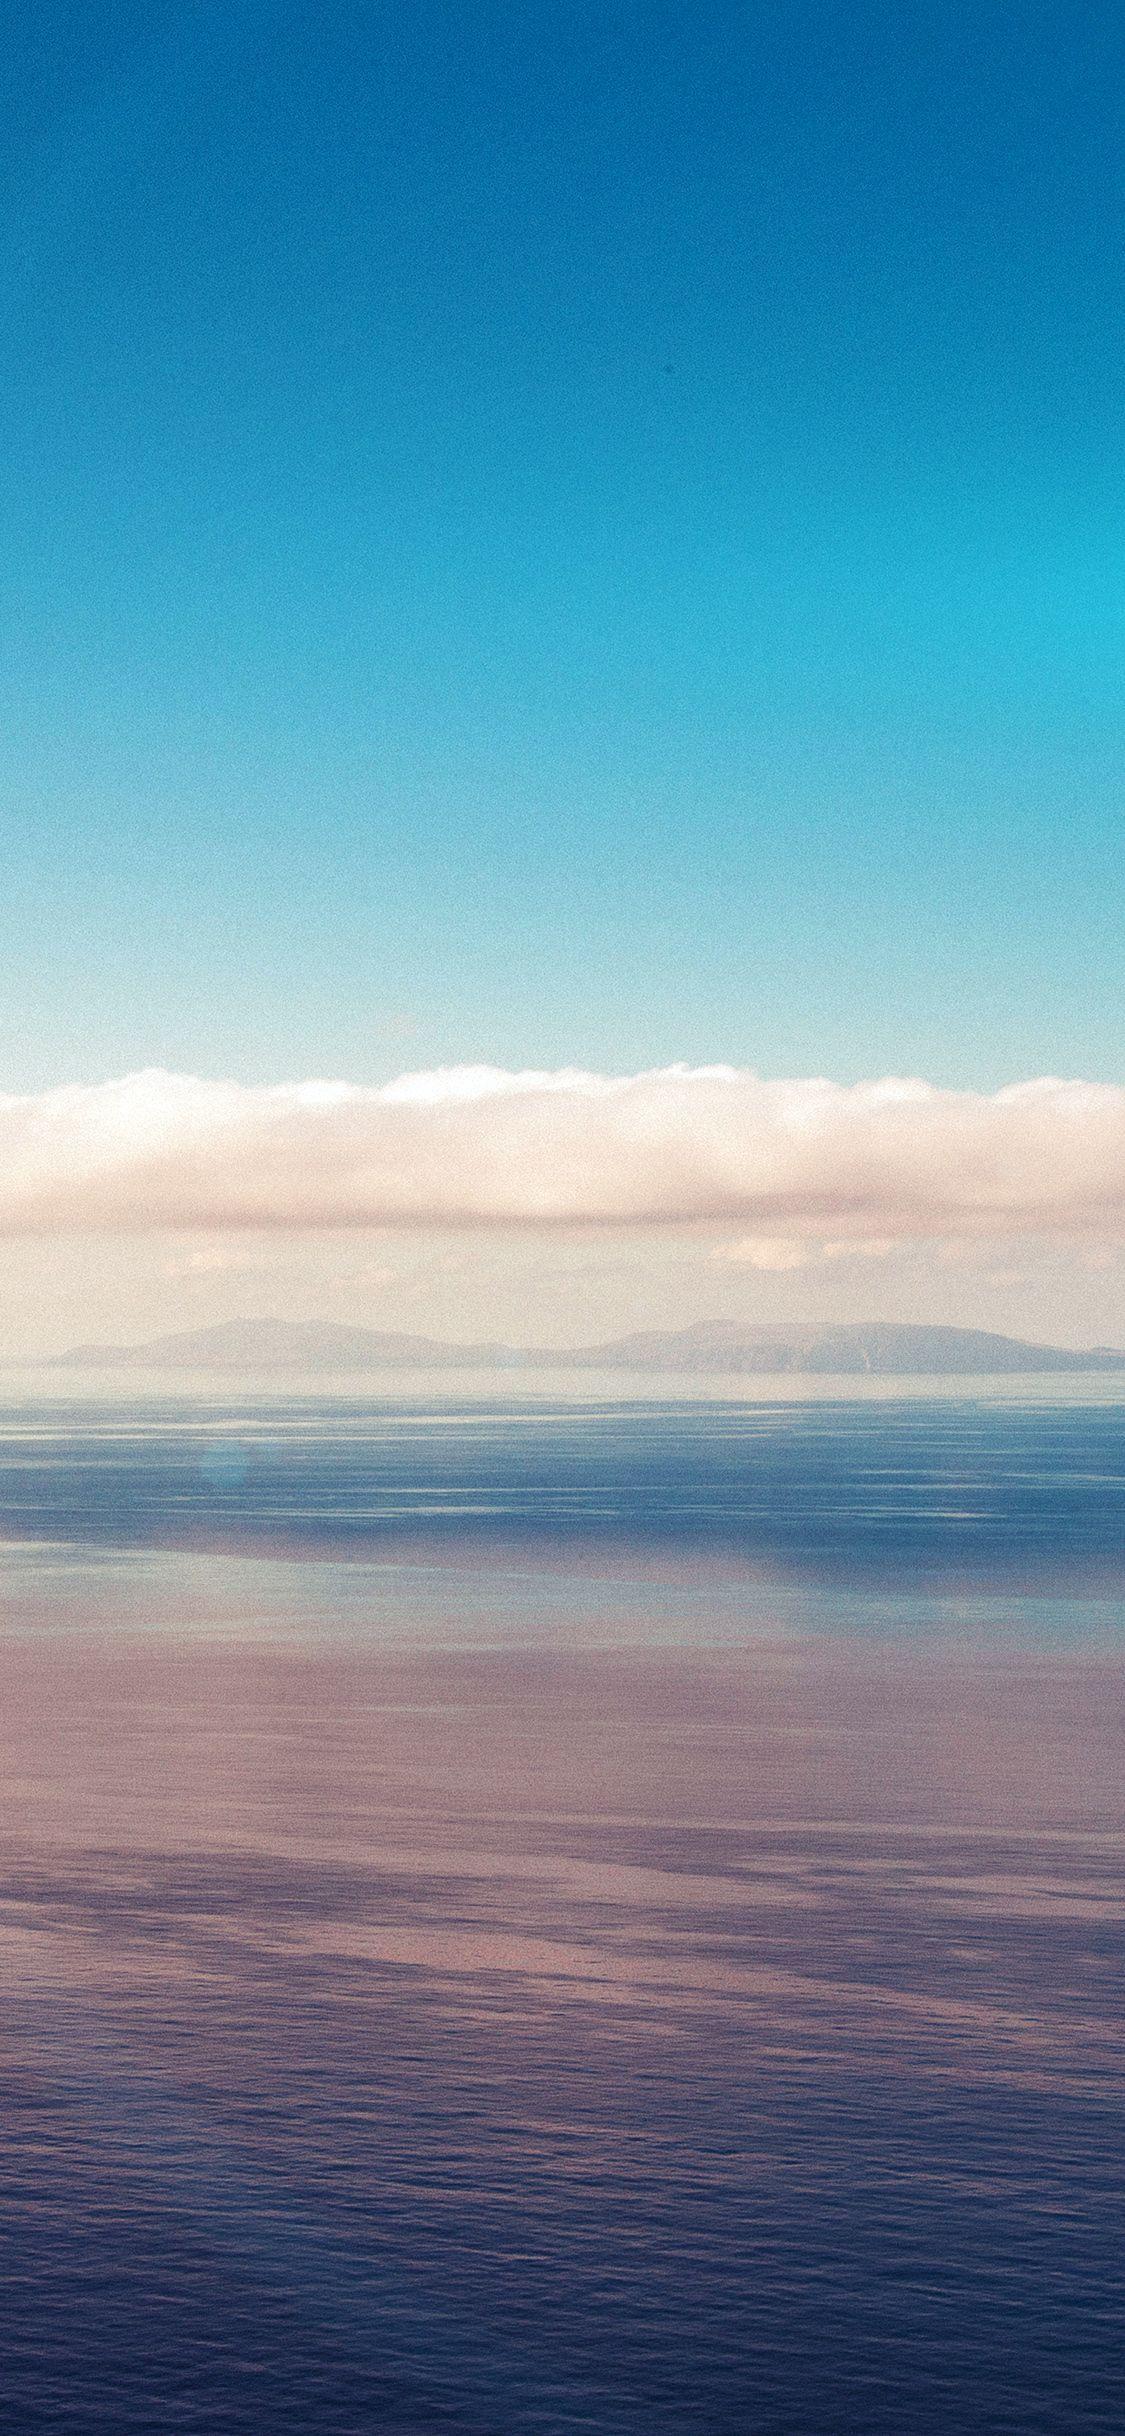 Blue Sky Apple Iphone Wallpapers Top Free Blue Sky Apple Iphone